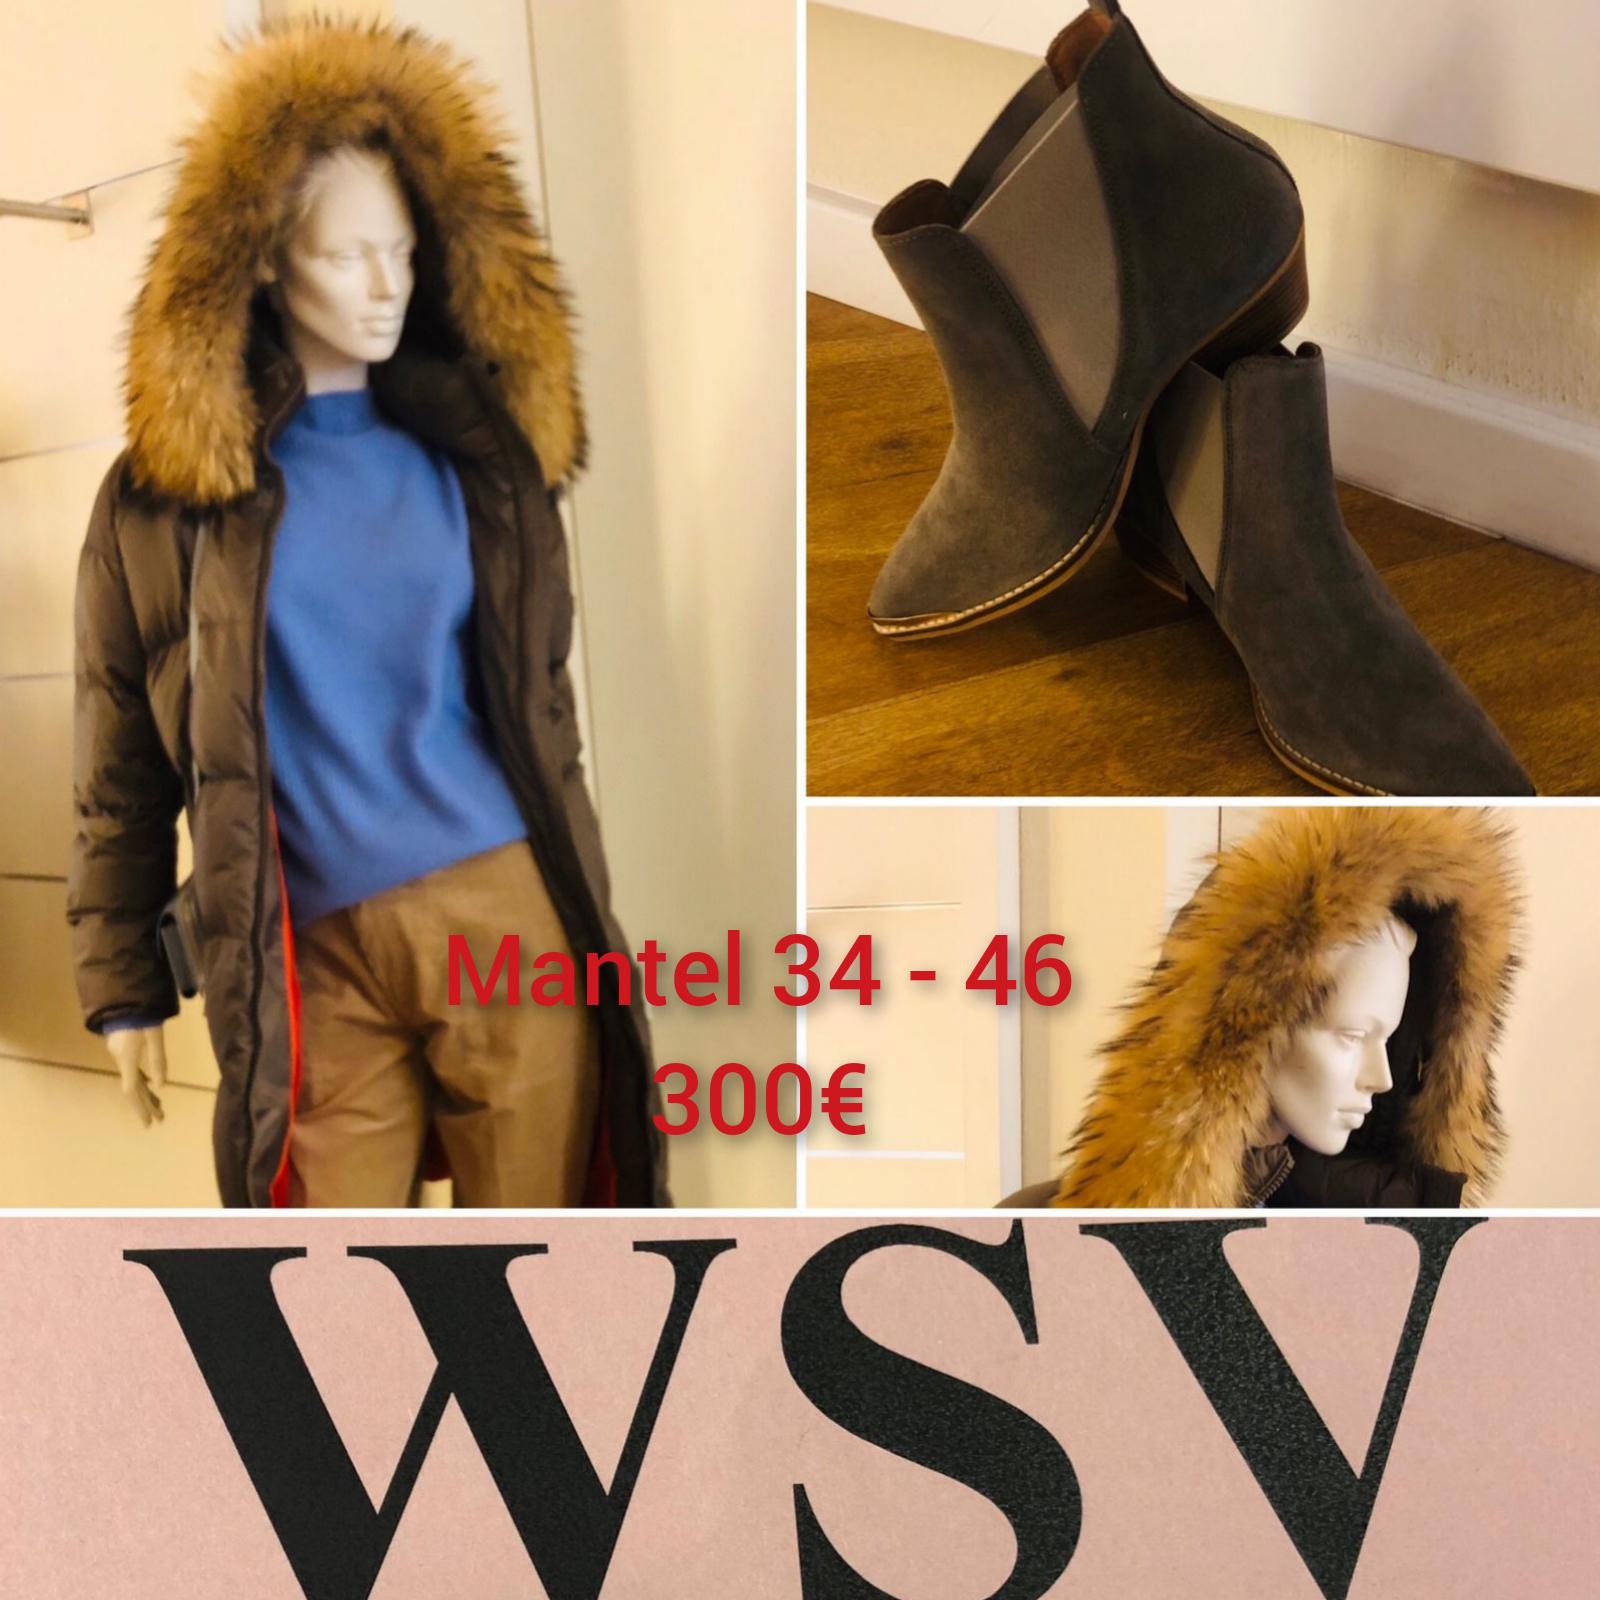 Mantel WSV